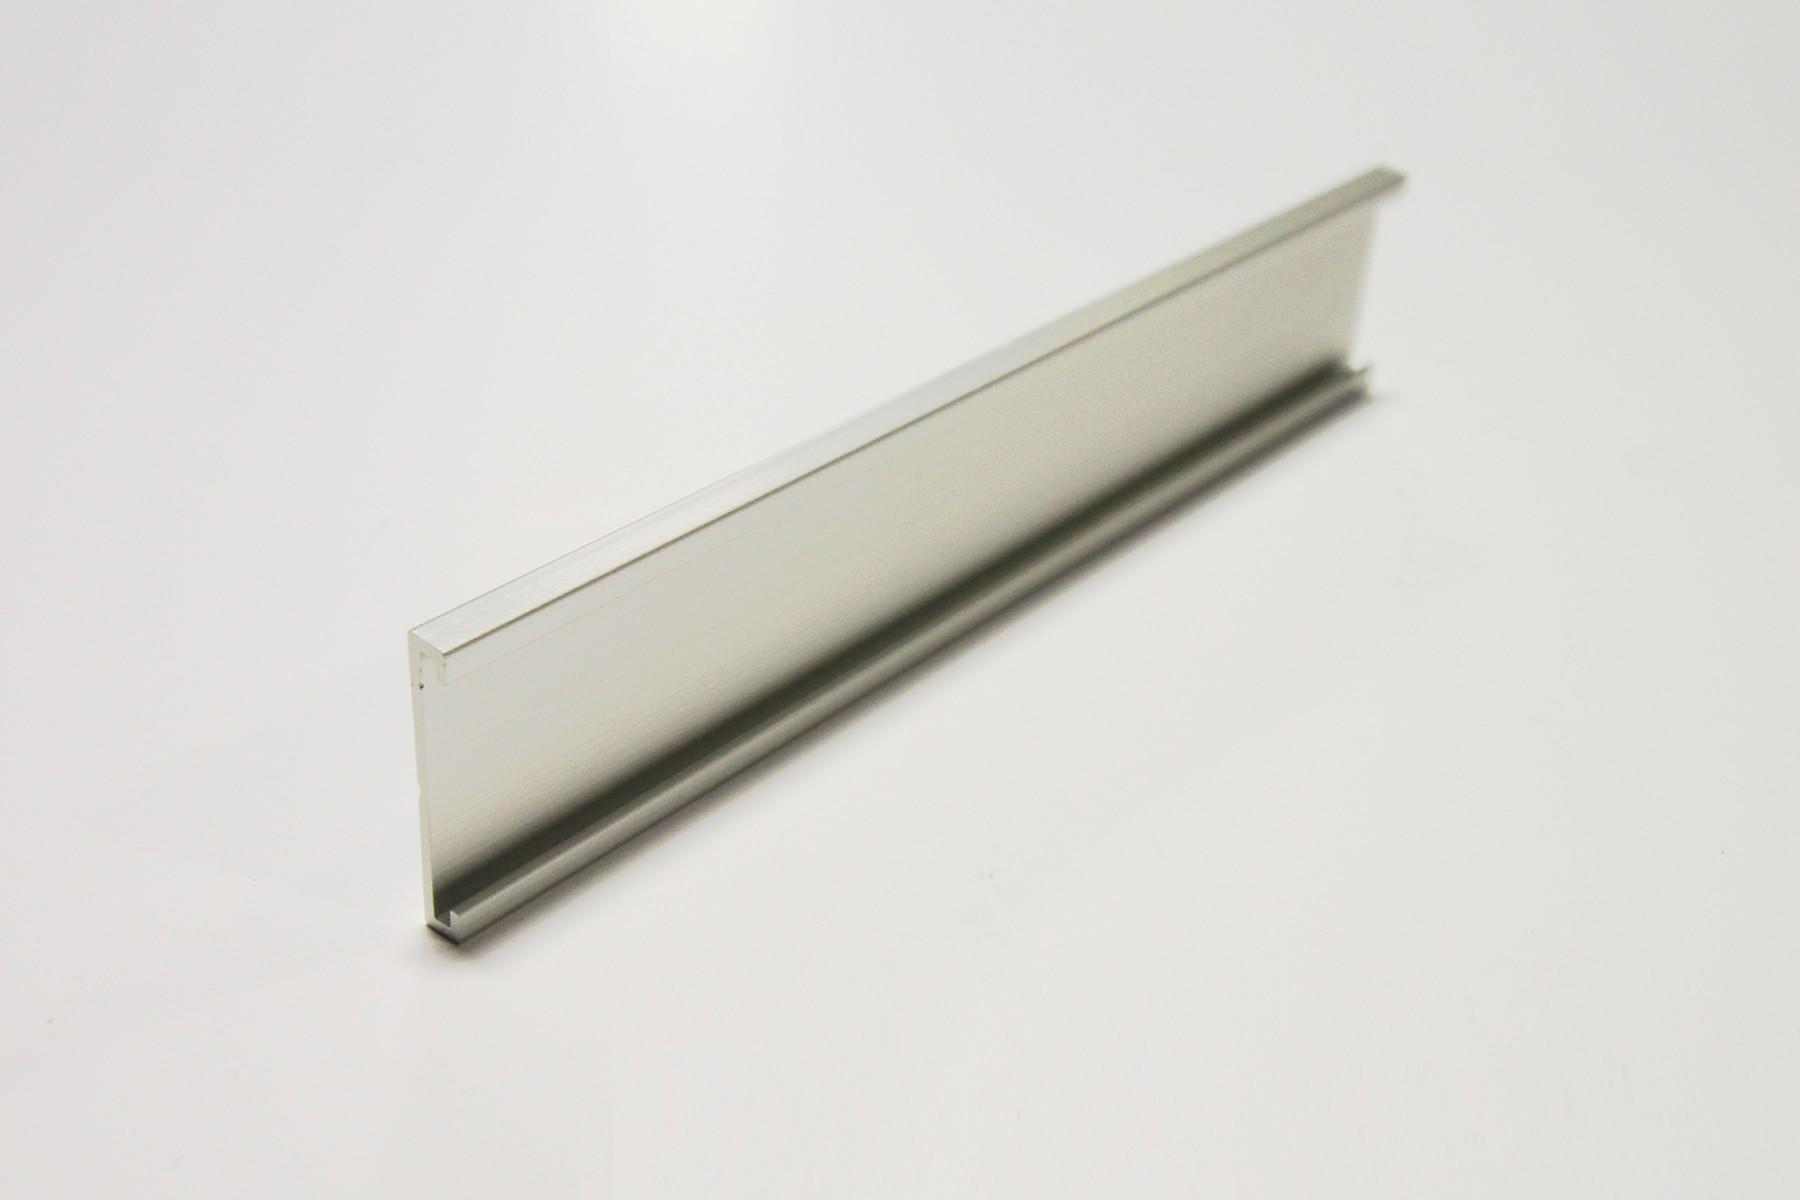 1 x 8 Wall Holder, Stn Silver